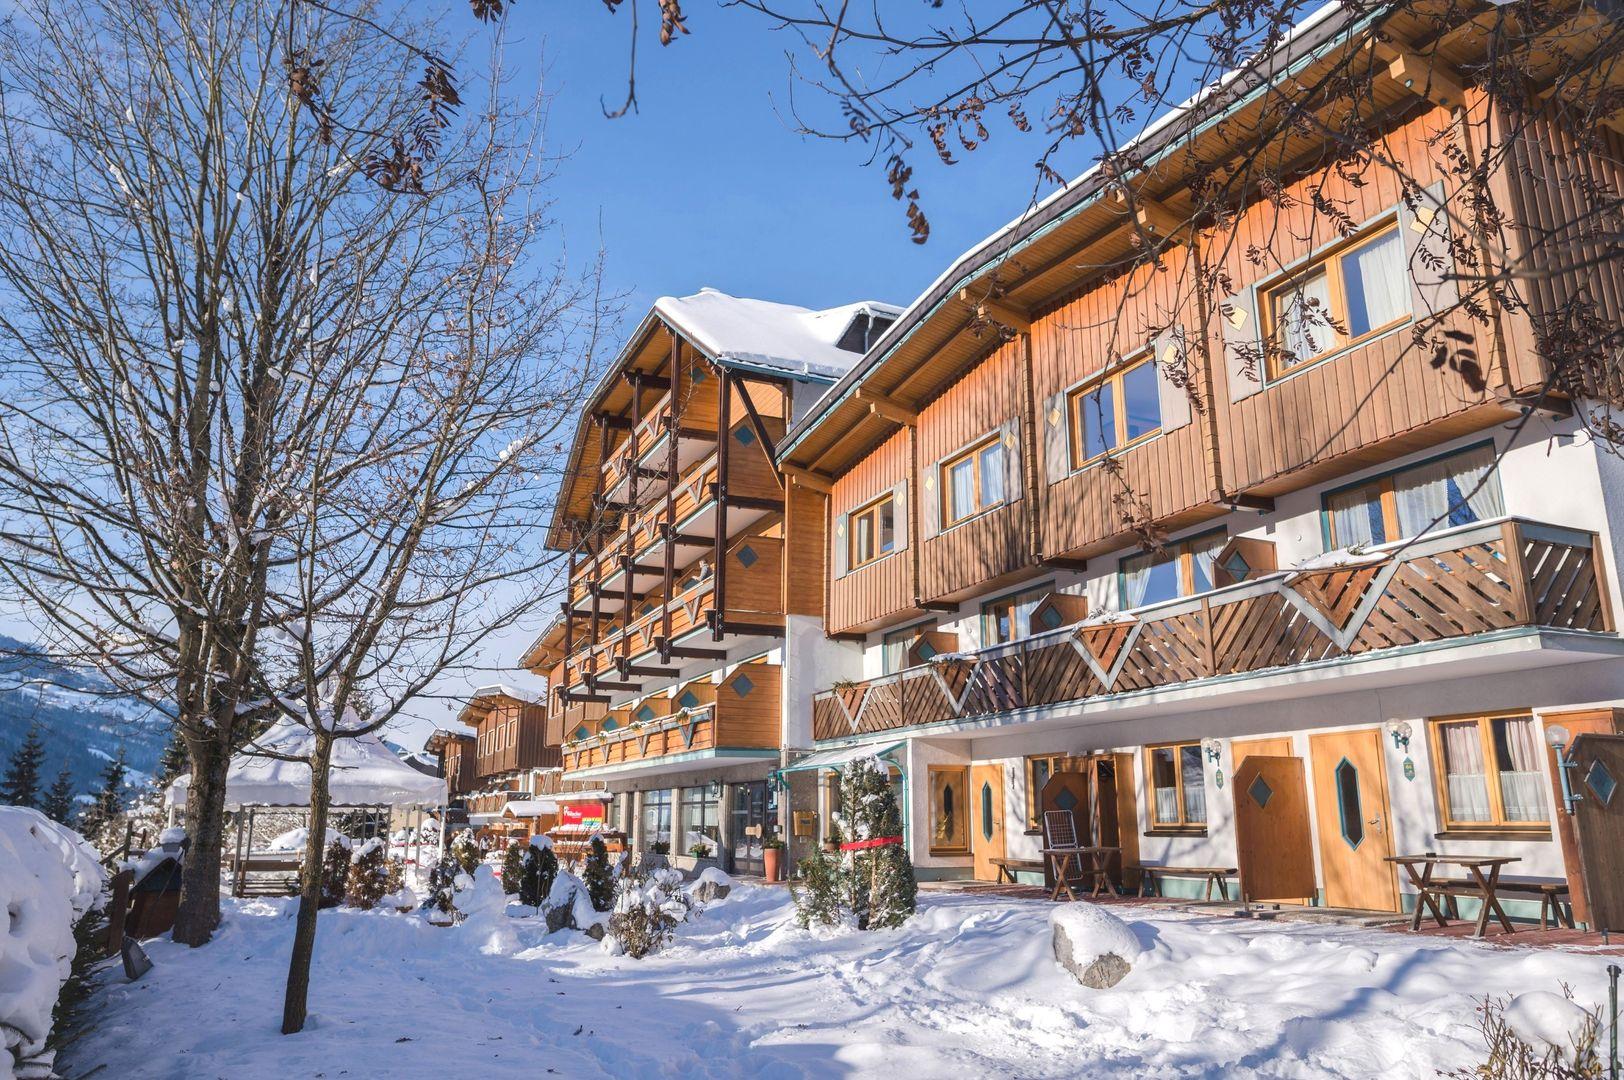 Slide1 - Hotel Ferienalm Schladming